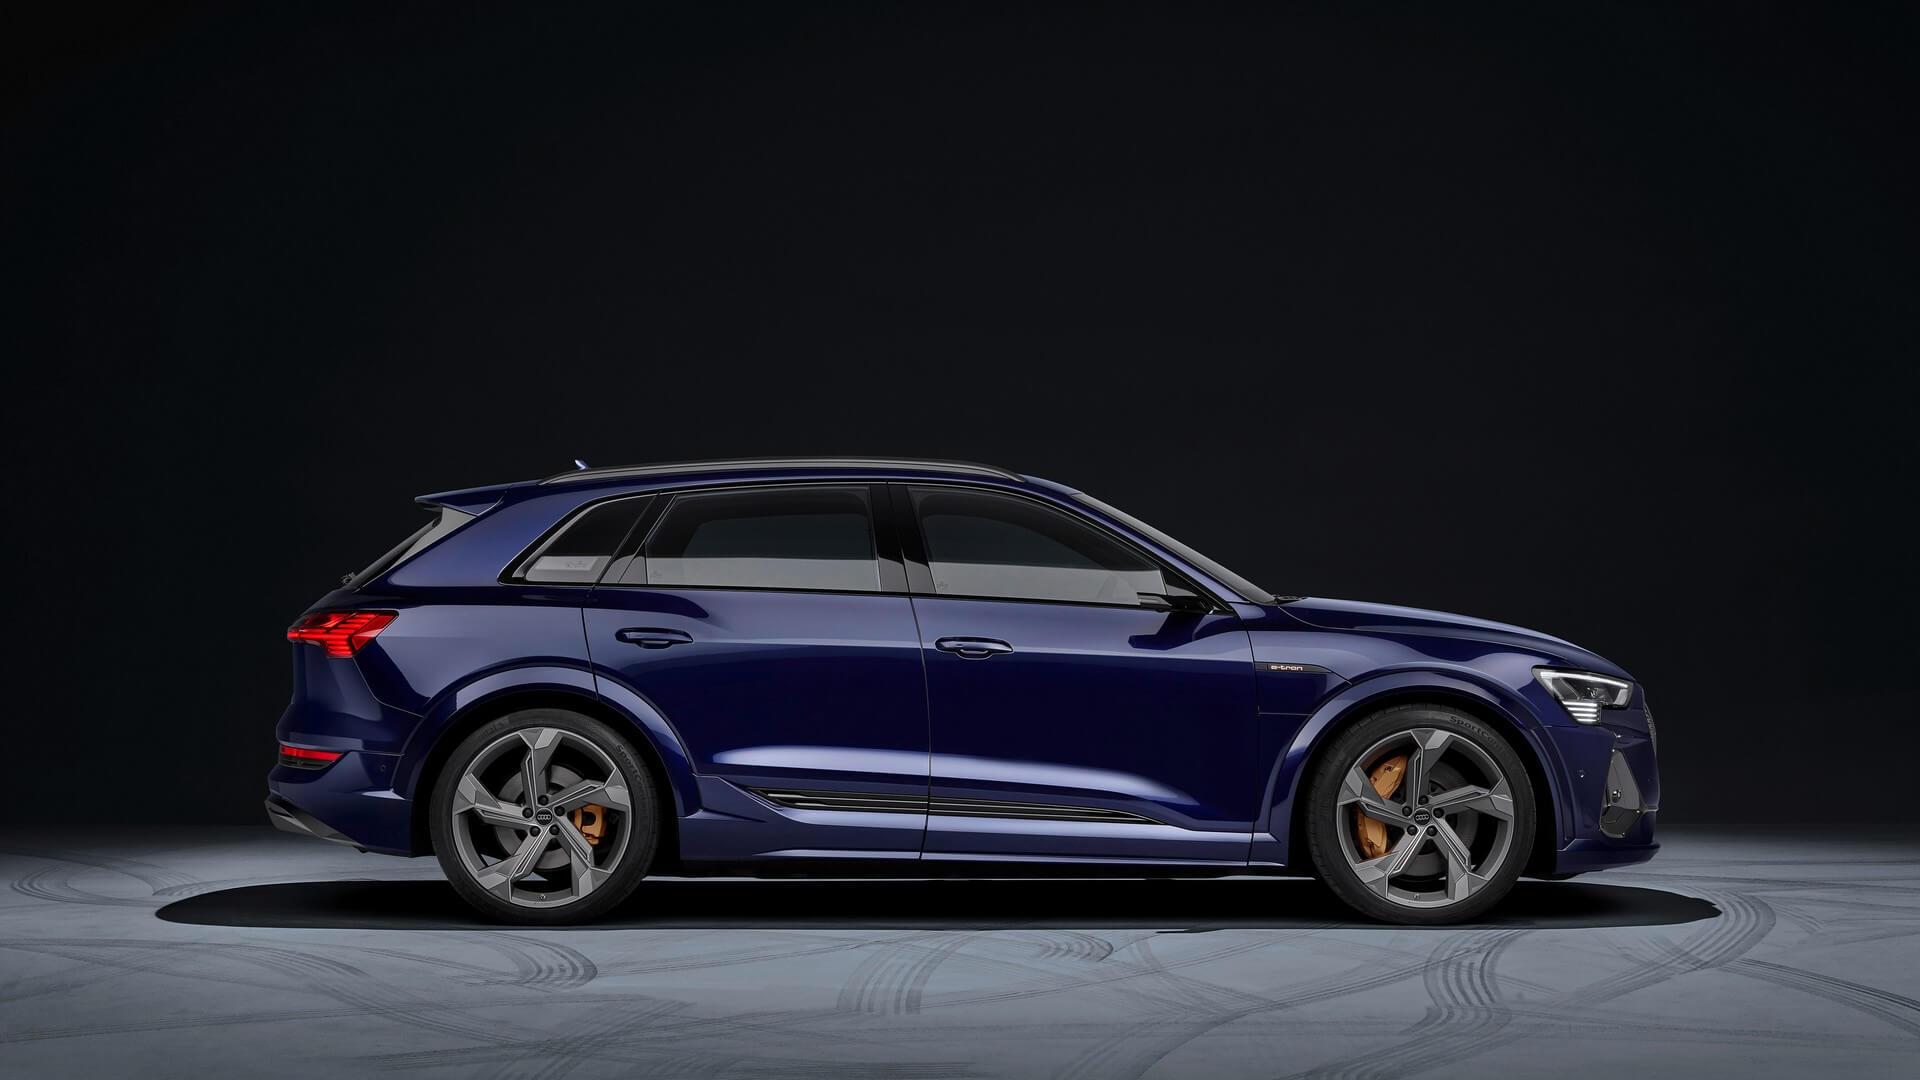 Audi-E-Tron-S-and-E-Tron-S-Sportback-2020-32